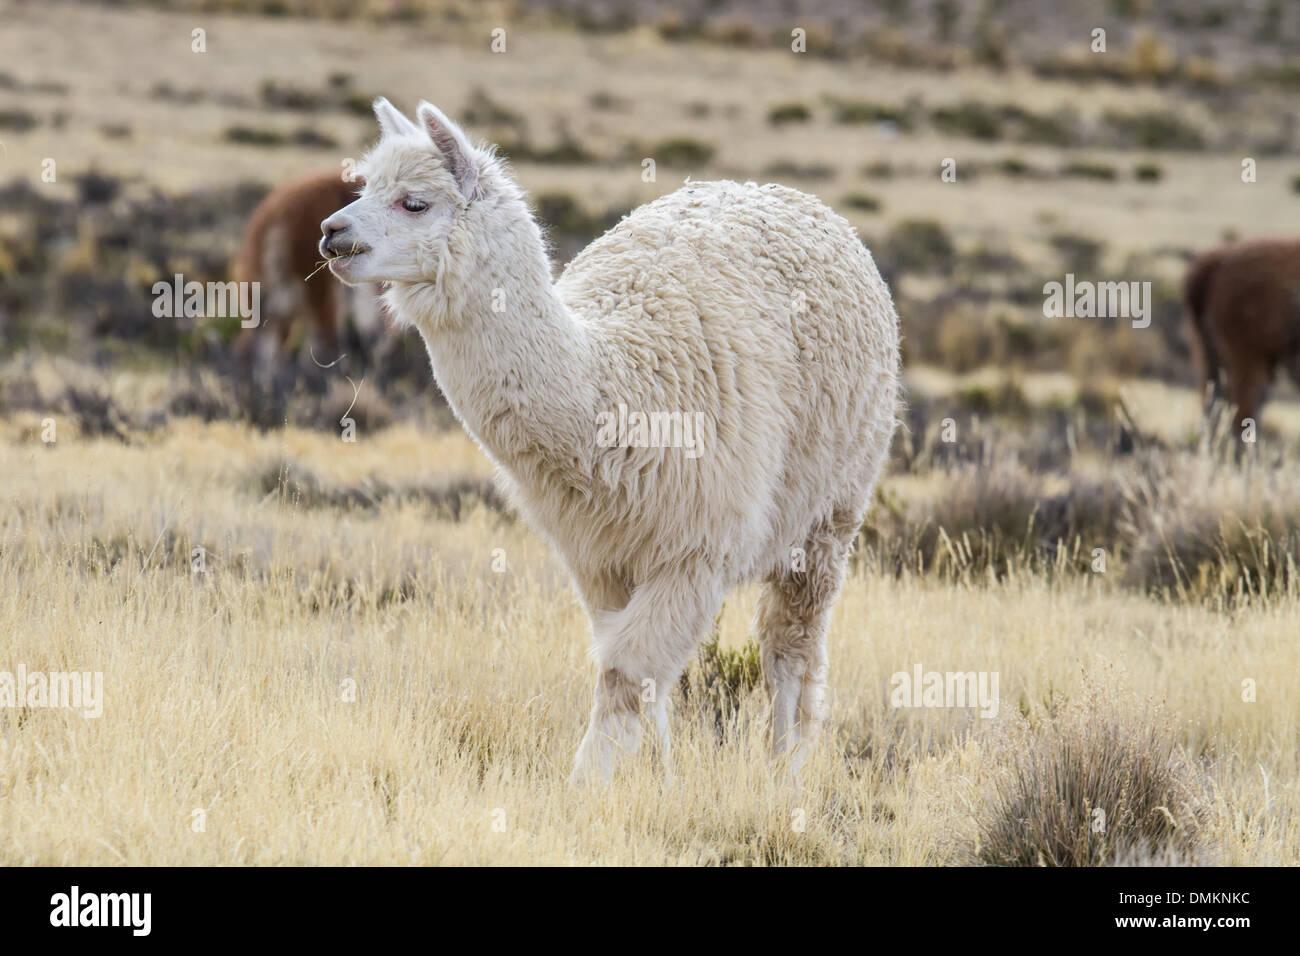 Alpaka in the peruvian highlands Stock Photo